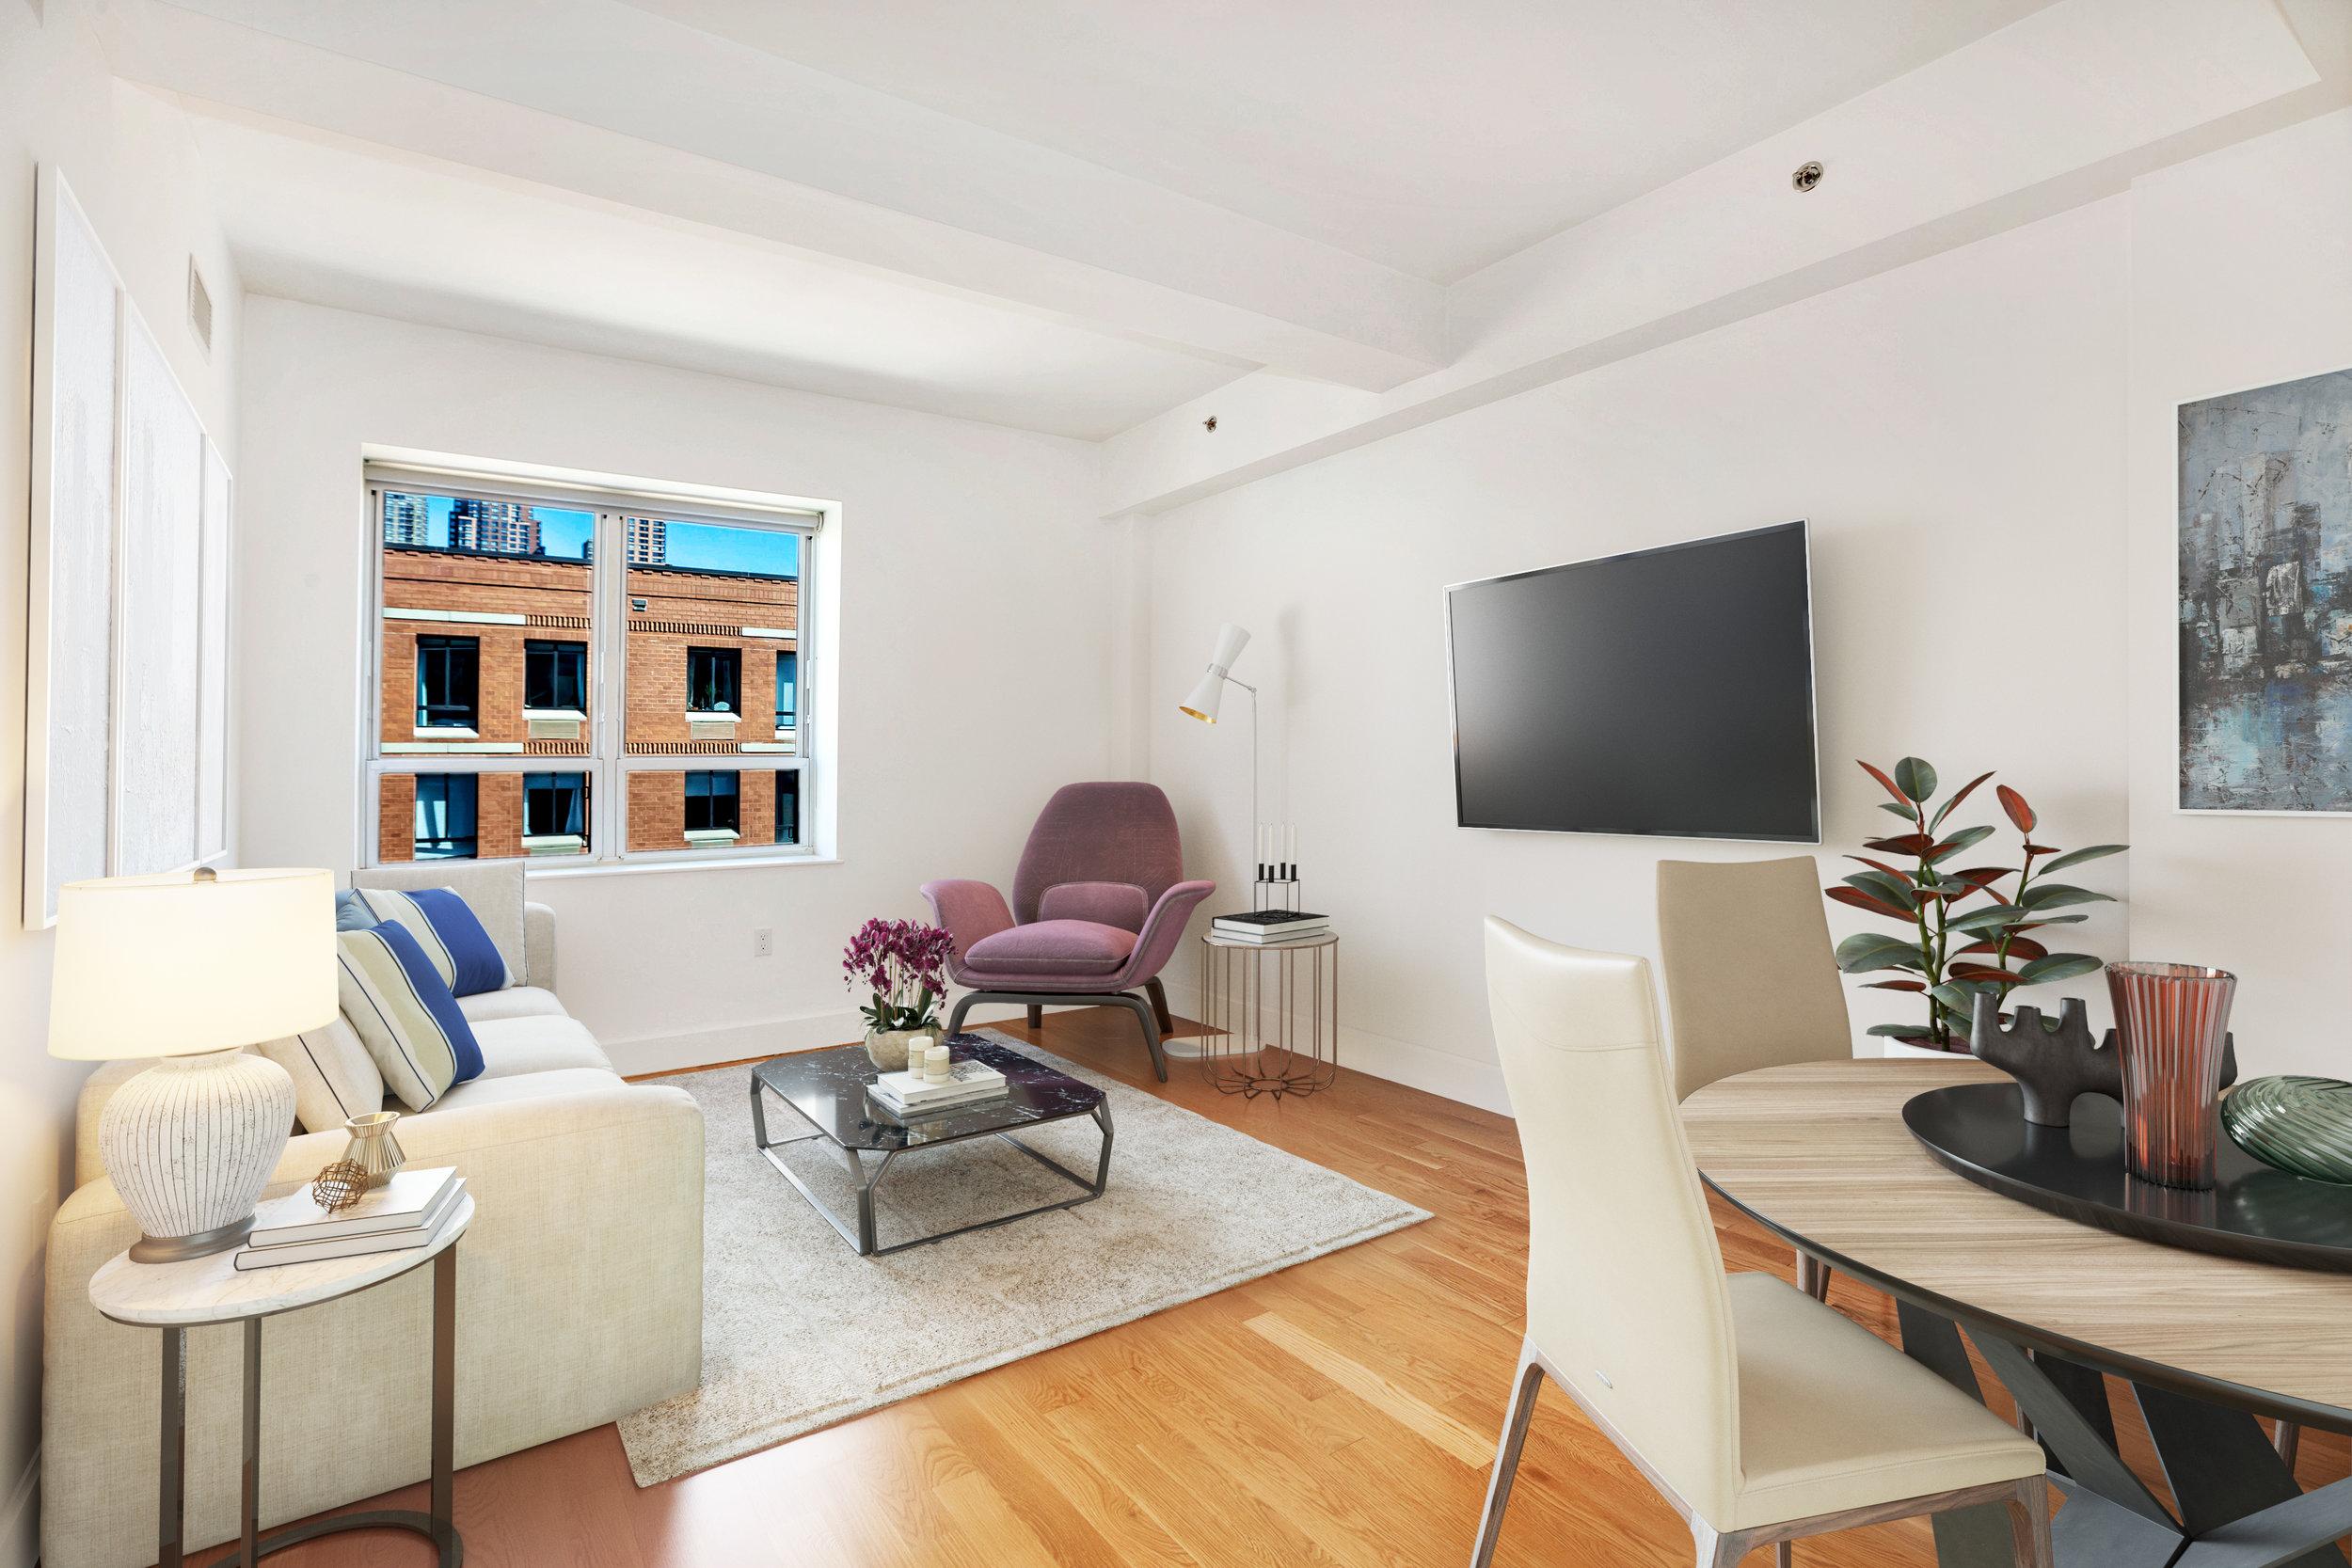 432 West 52nd Street, #6F - $950,000